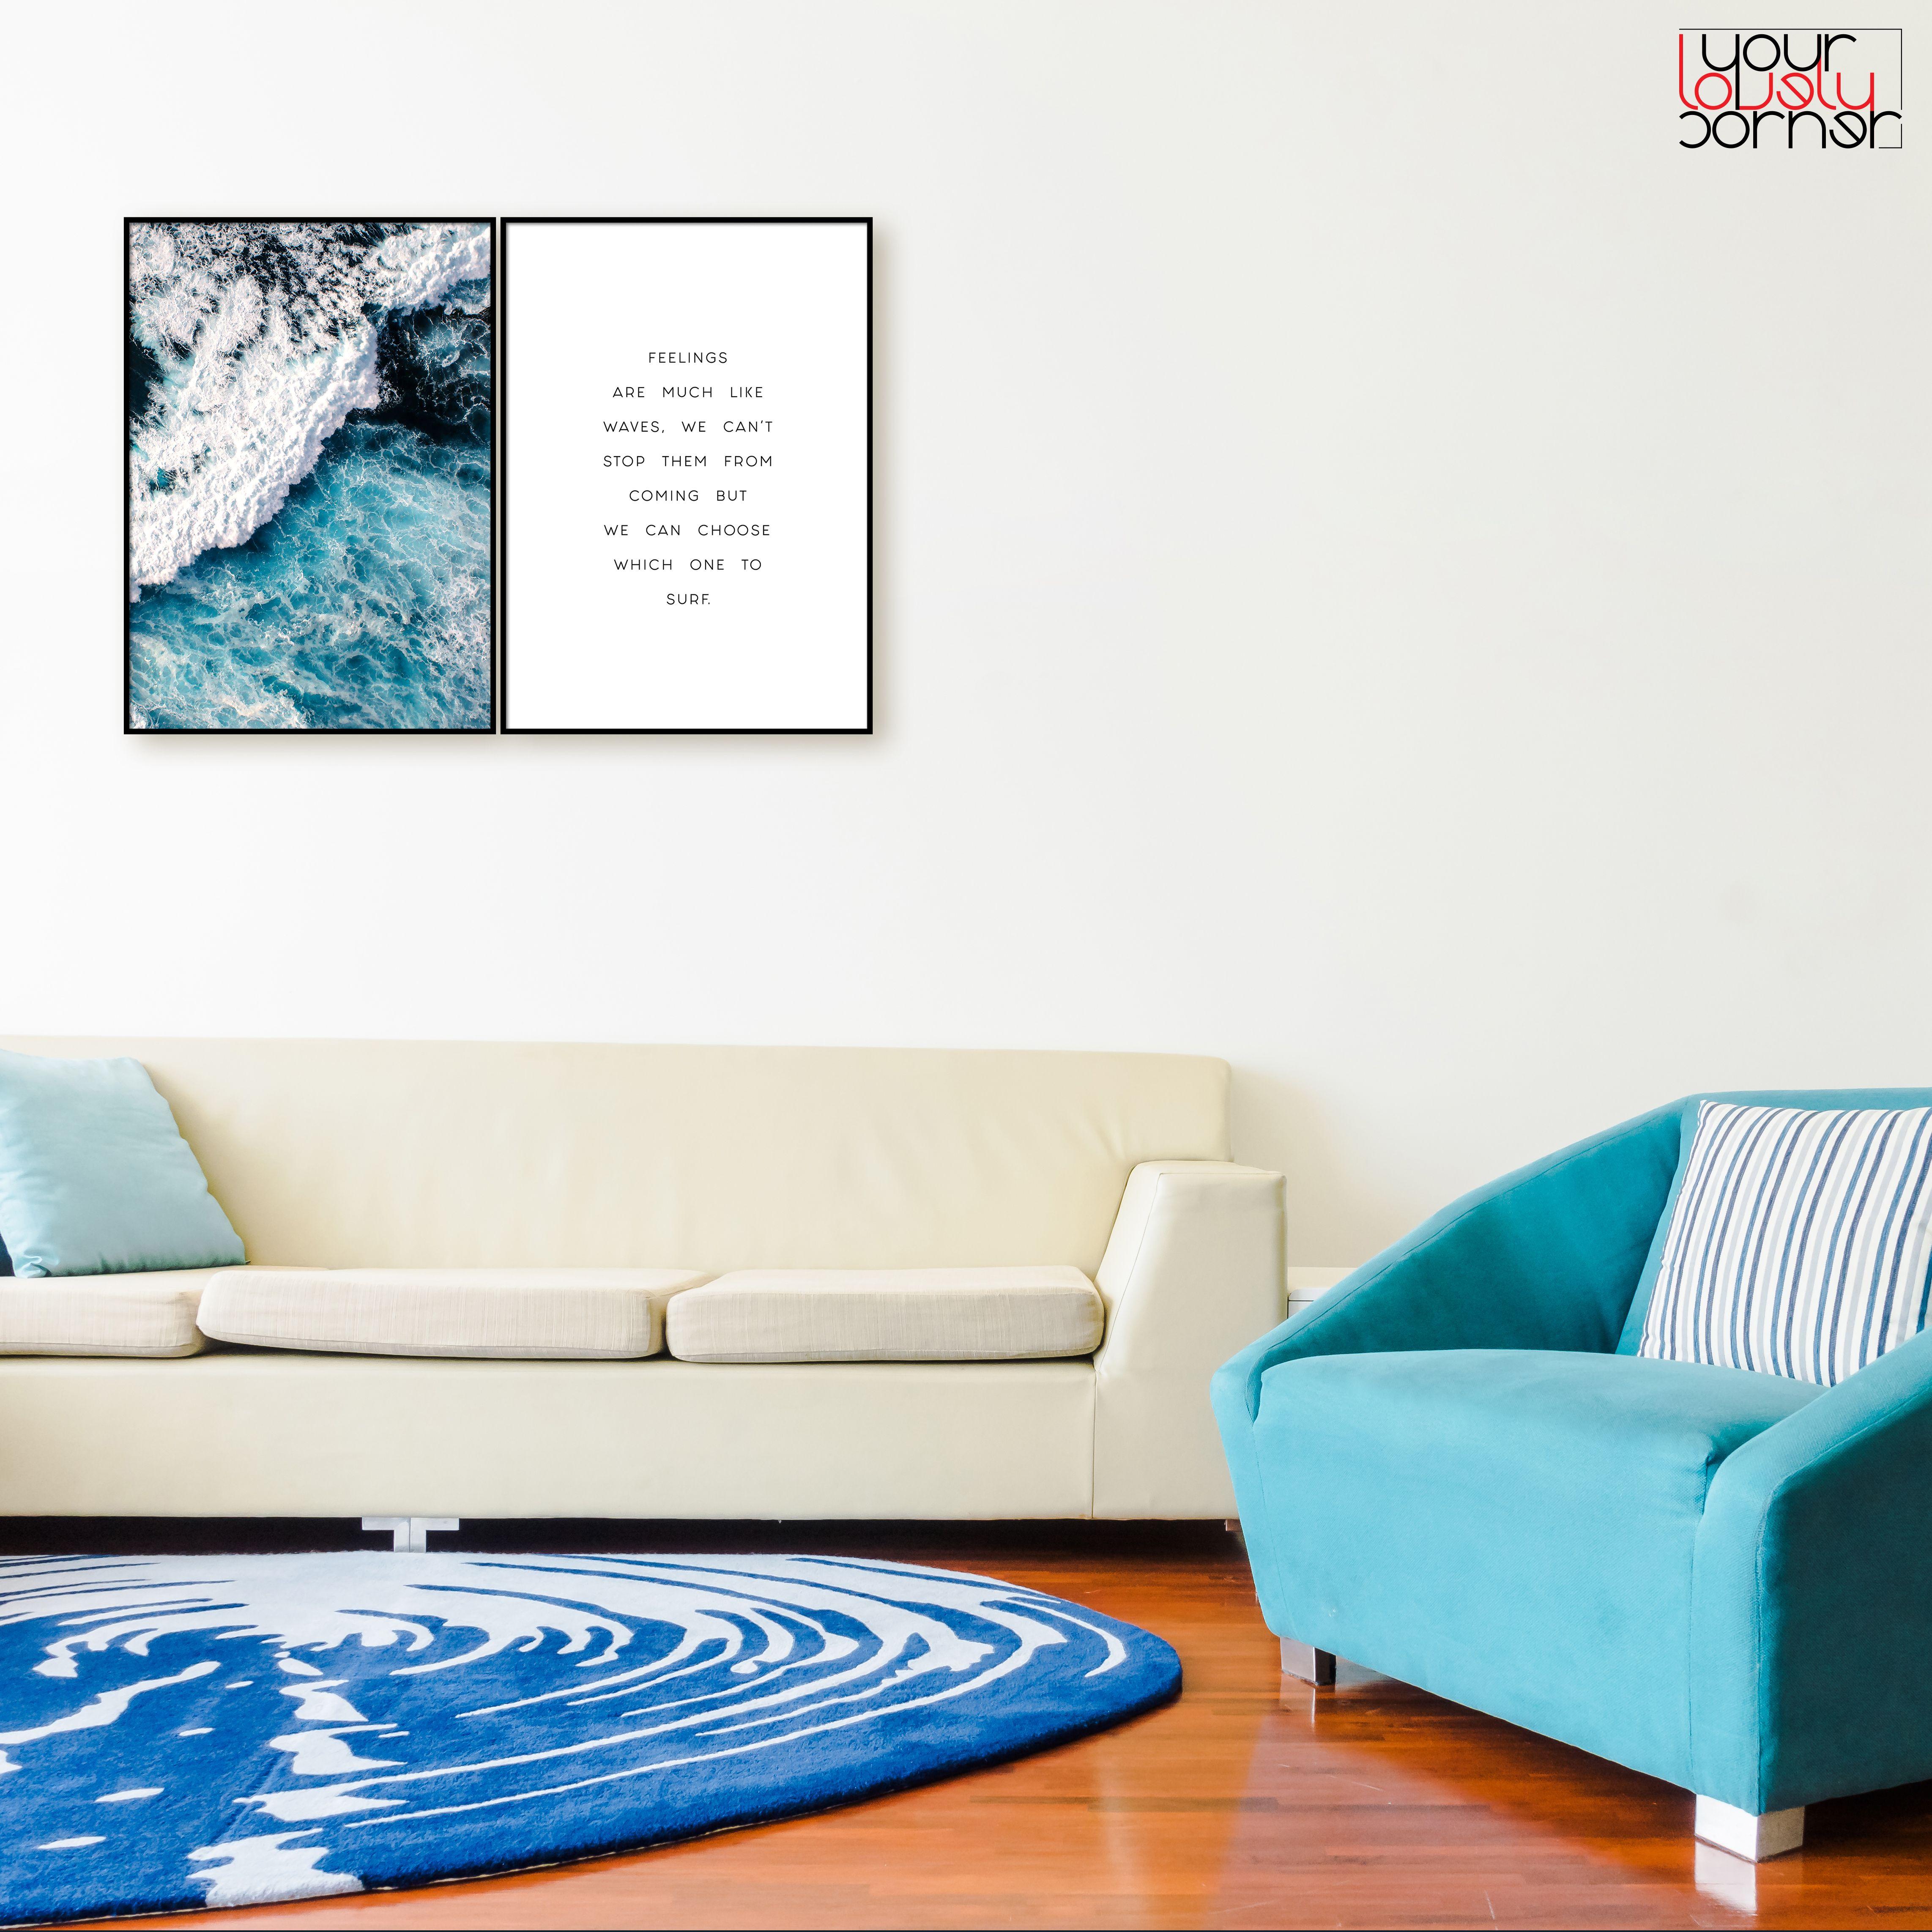 Ocean Wave Printable Ocean Foam Ocean Waves Photo Blue Wave Print Wave Wall Art Sea Waves Print Ocean Minim Nordic Decor Wall Decor Bedroom Coastal Decor